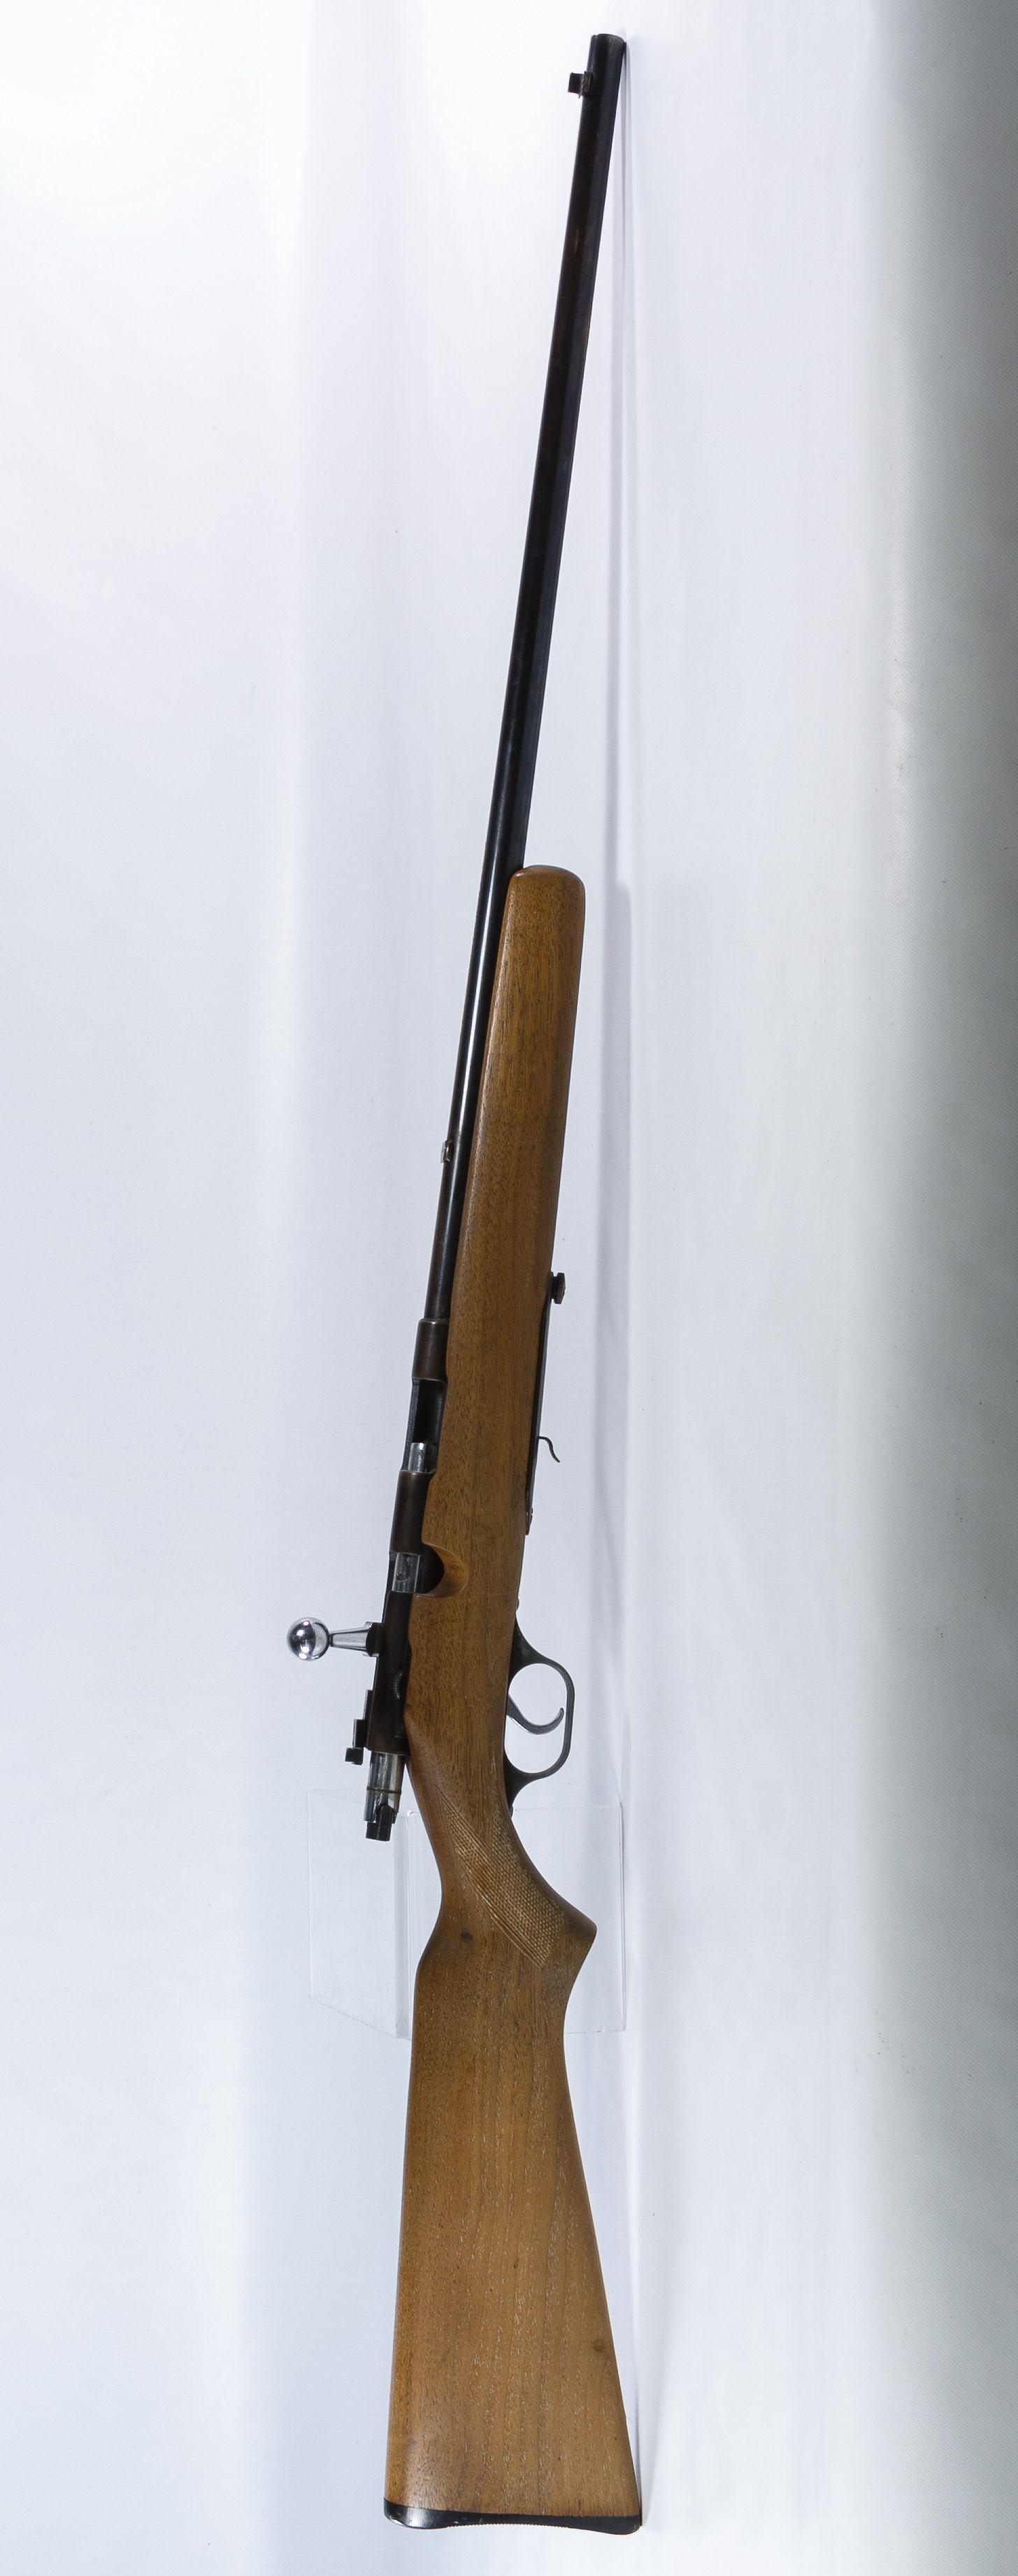 Lot 271: Savage Model 4C  22 Cal  Rifle (No Serial